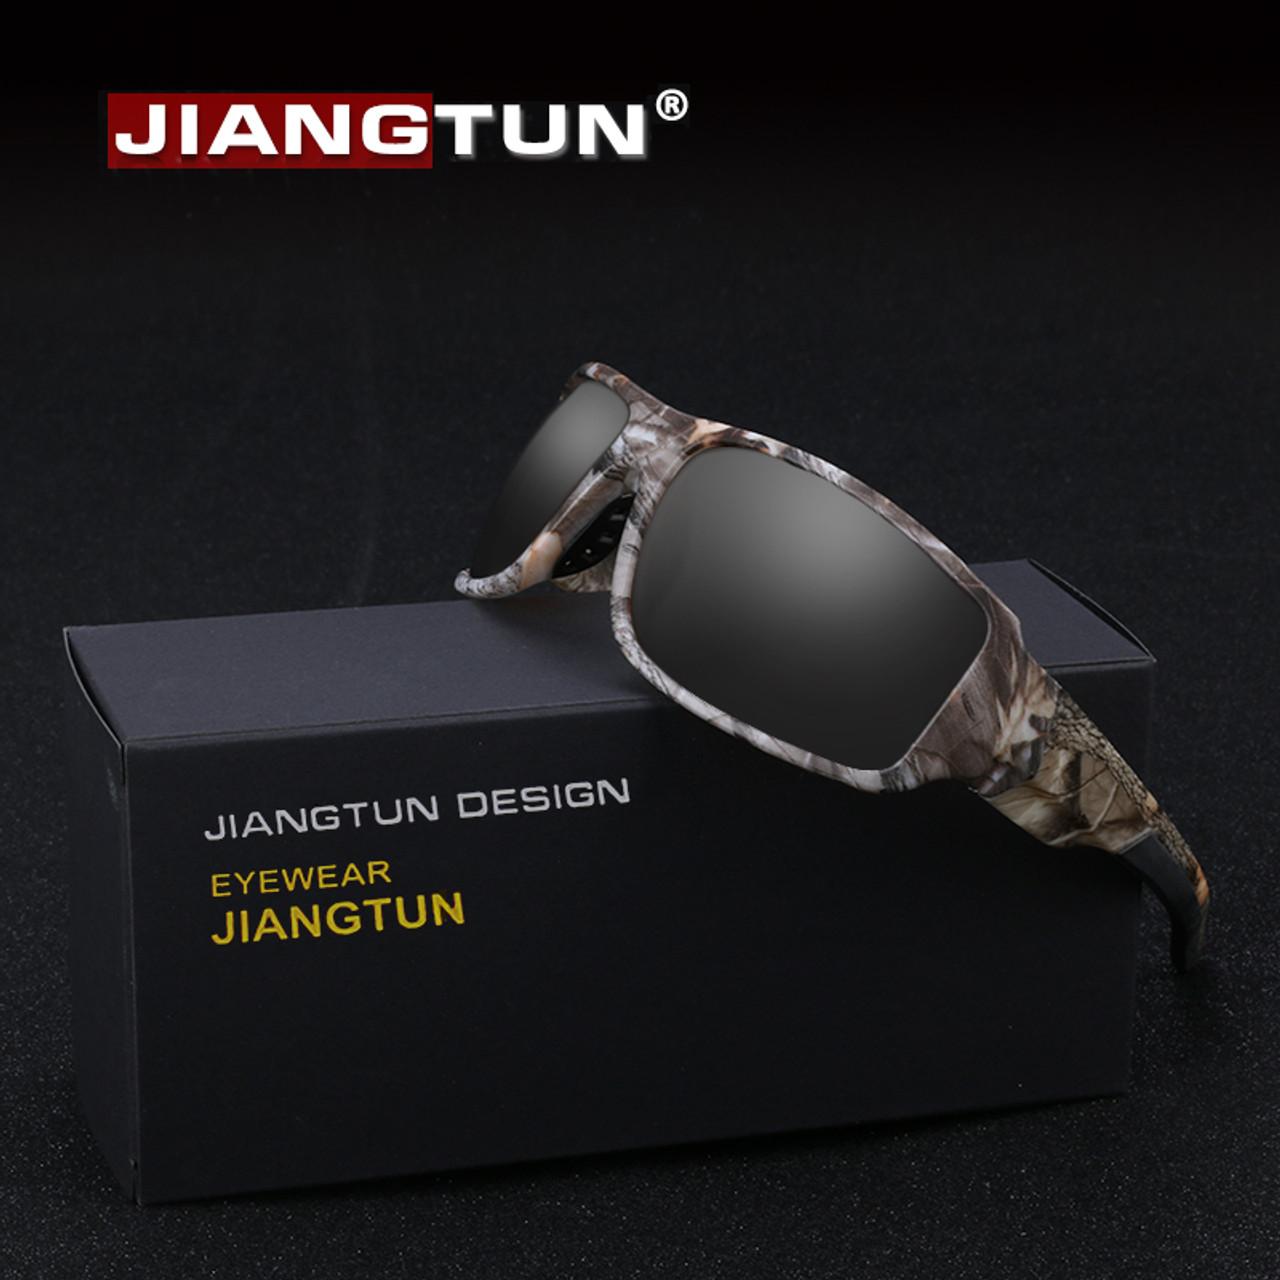 9e3a808e61 JIANGTUN 2018 Top Fashion Camo Black Polarized Sunglasses Men Cool Style  Quality Sun Glasses Anti- ...